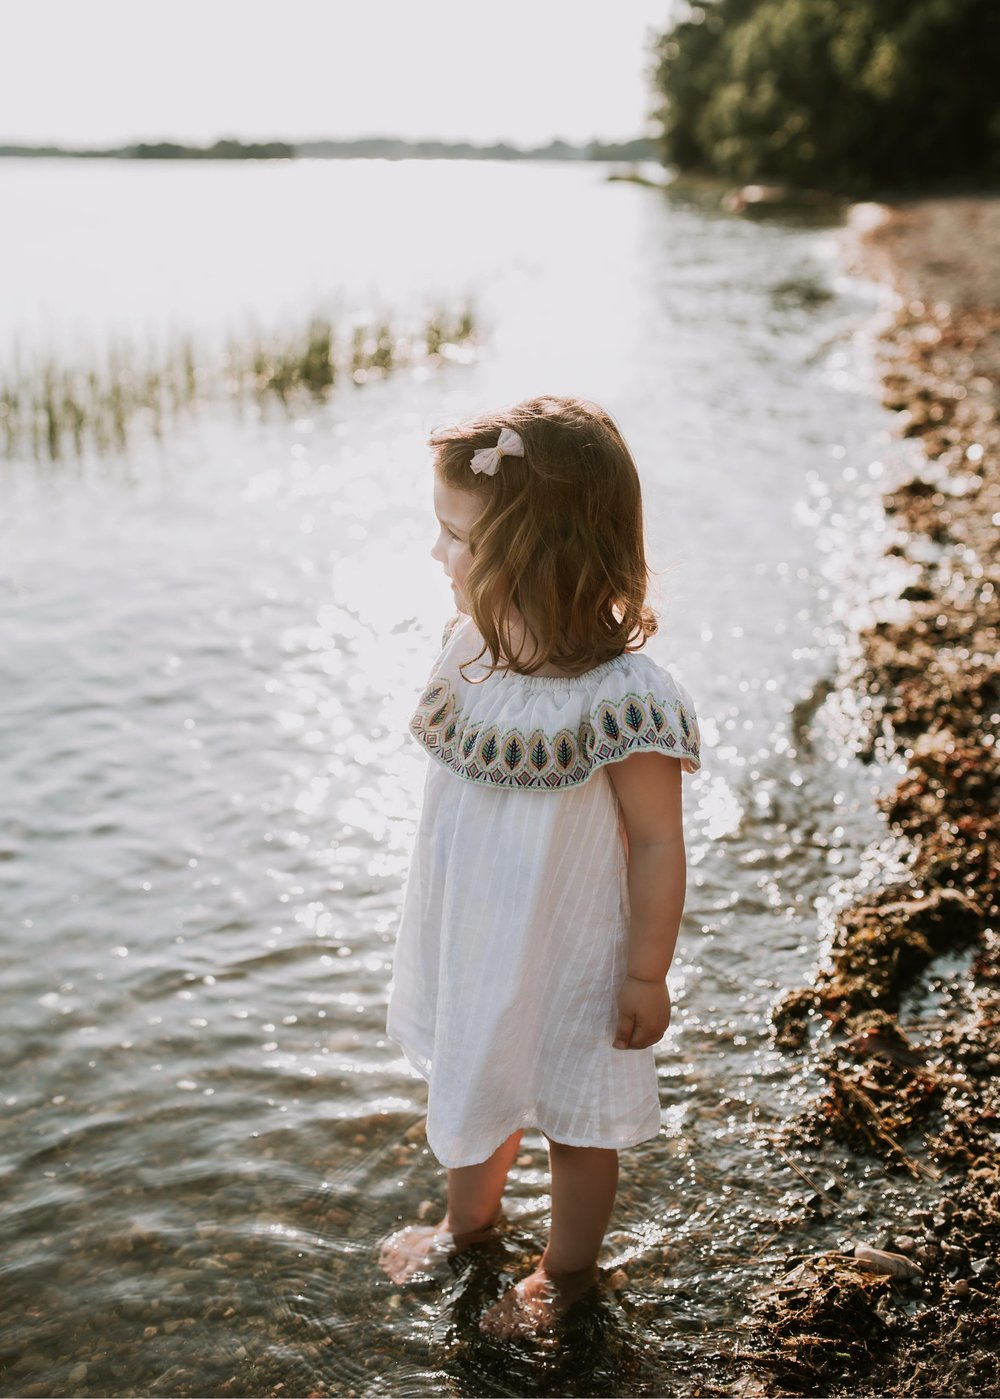 Summers_August_2018-157_Beautiful_Natural_Portraits_by_Award_Winning_Boston_Massachusetts_Family_Portrait_Photographer_Asher_and_Oak_Photography.jpg